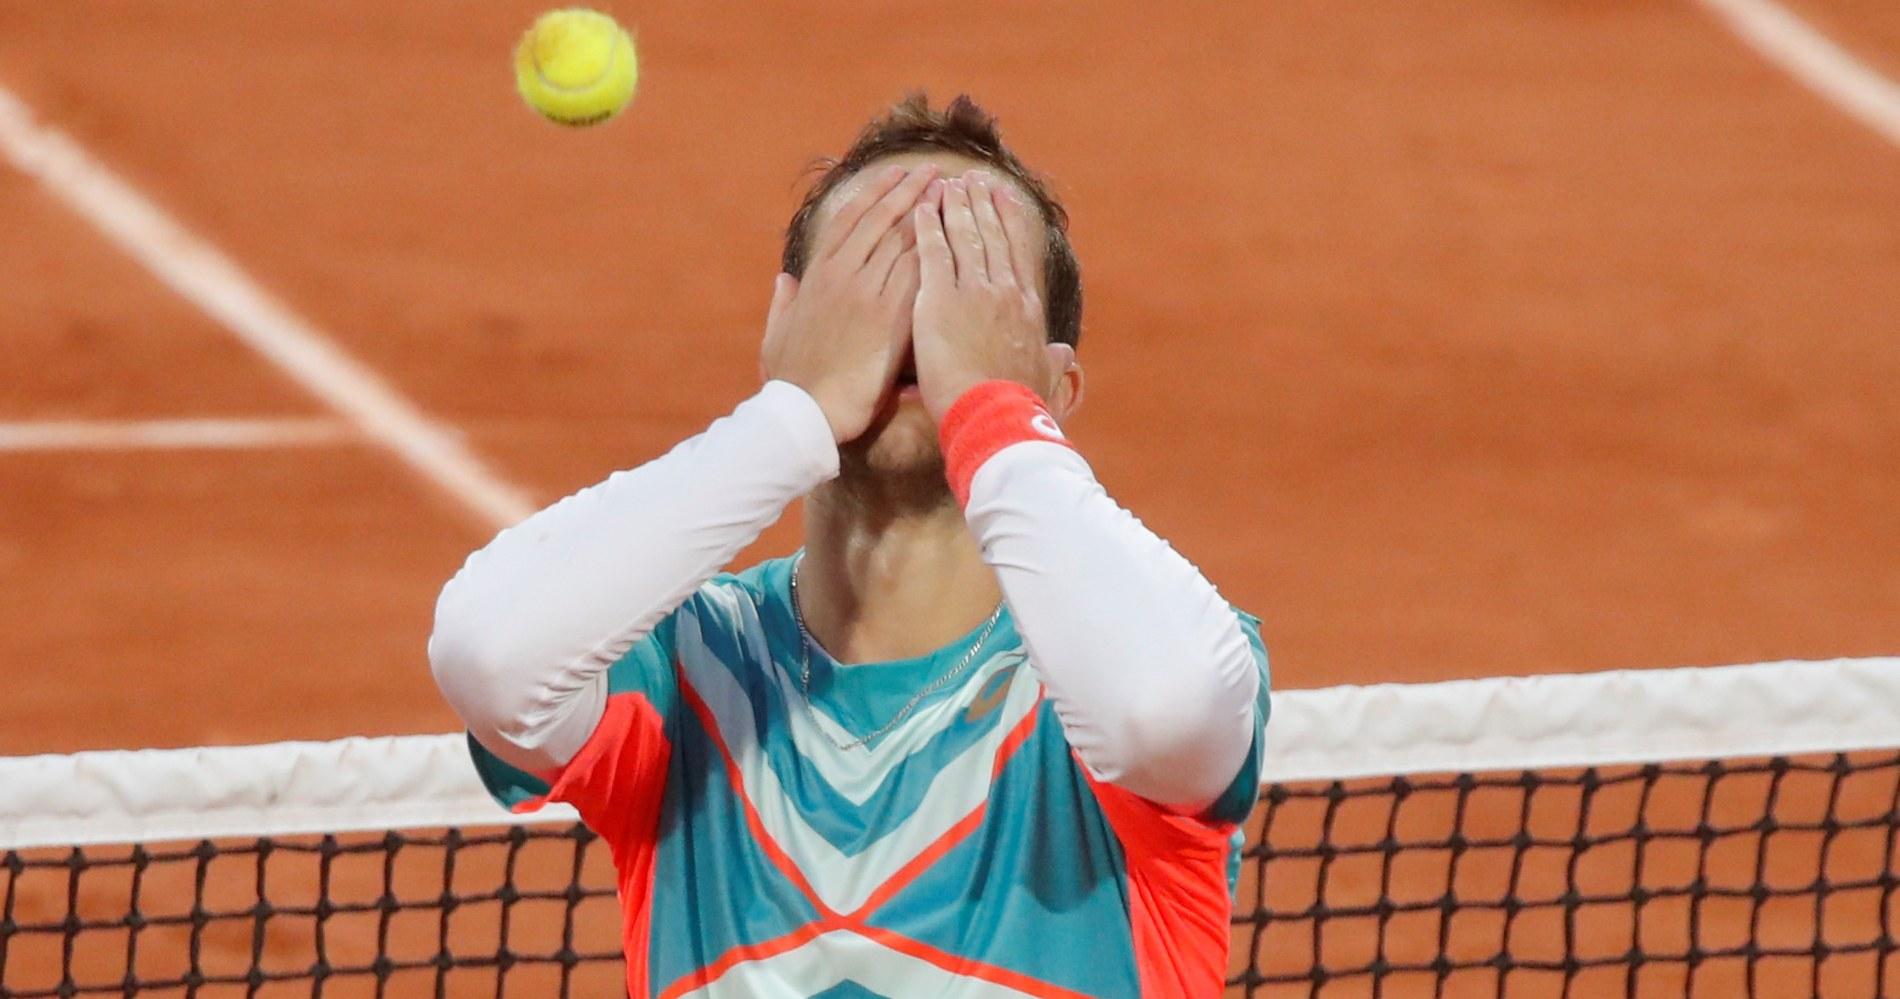 Gaston Roland Garros 2020a